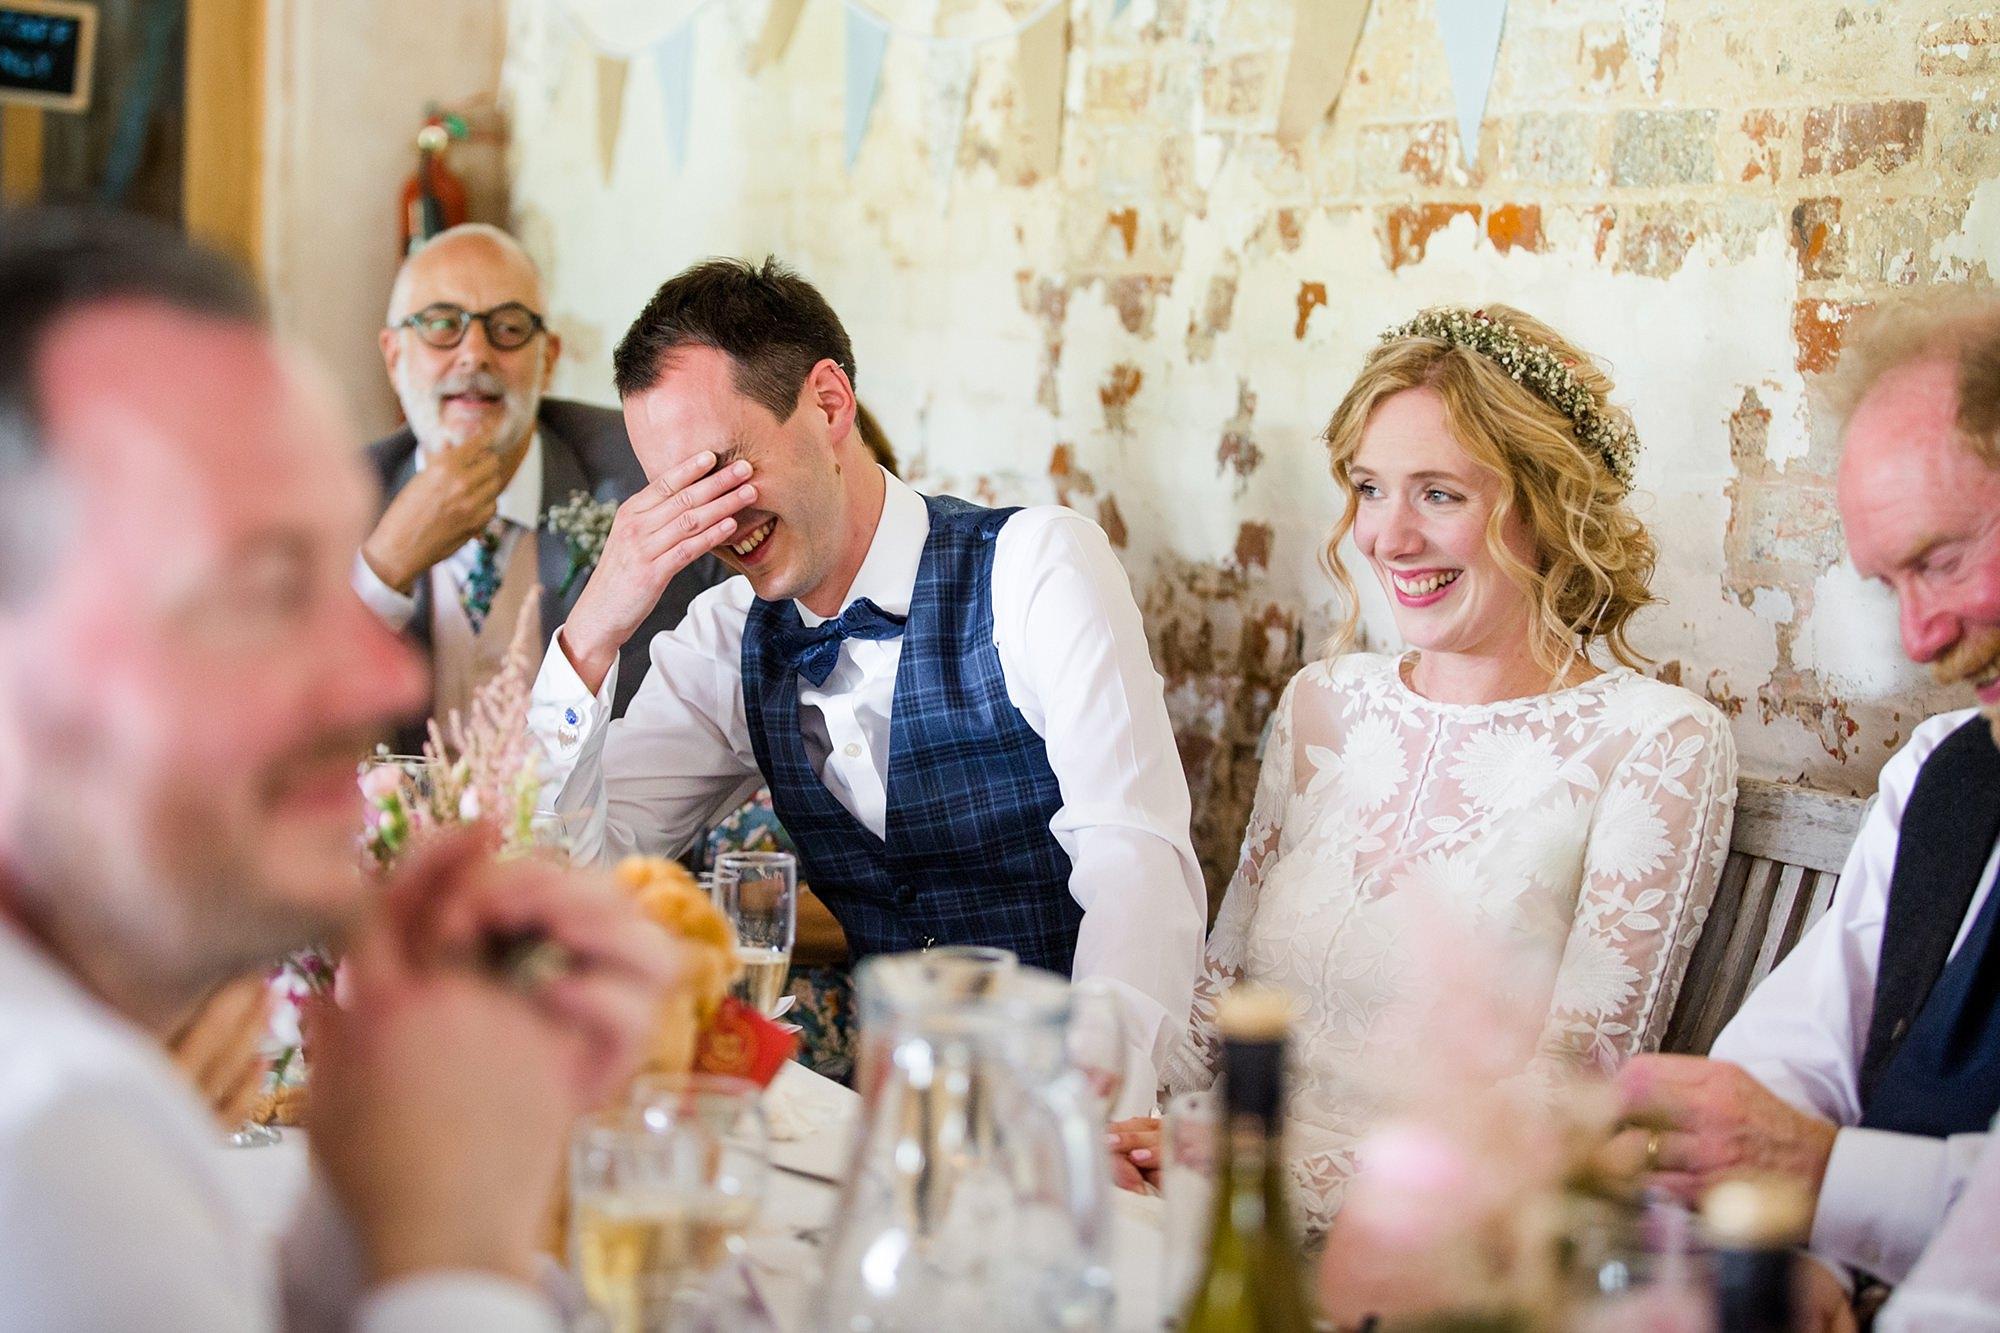 Isis Farmhouse Oxford Wedding fun portrait of groom cringing during best man speech